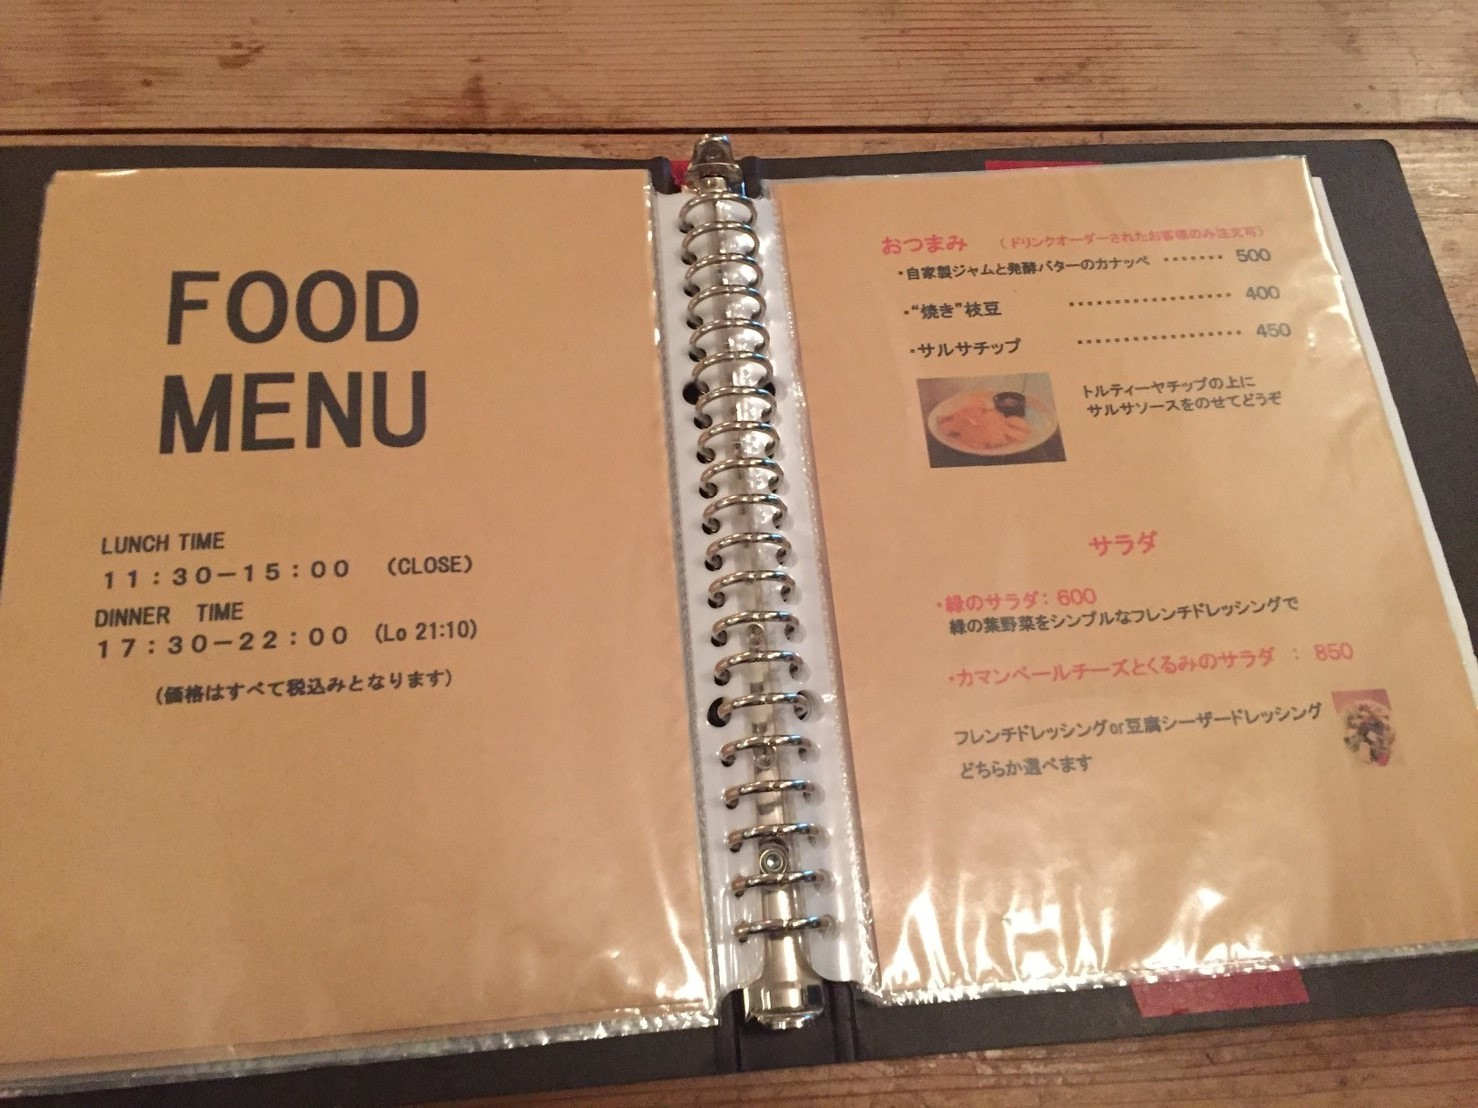 TAO CAFE にて夕食_e0115904_02065909.jpg